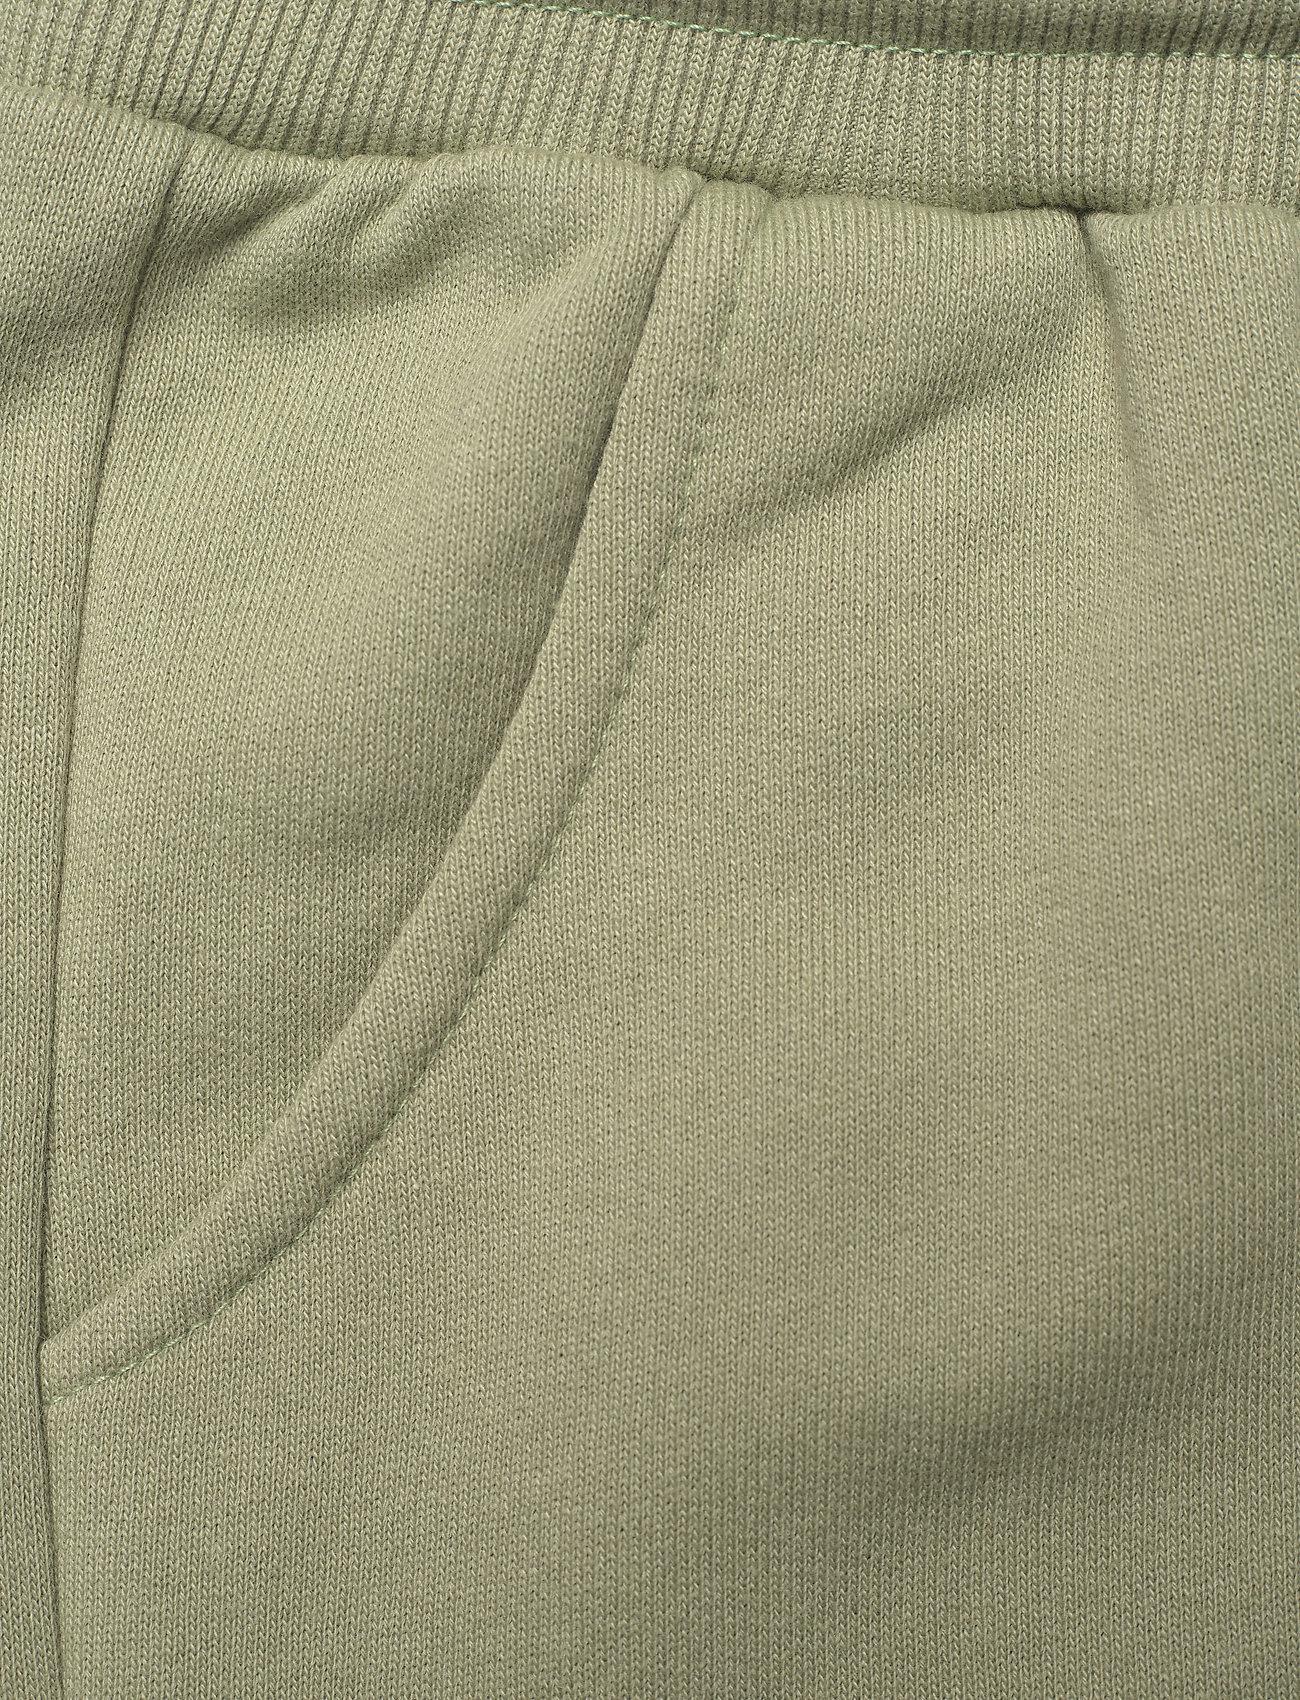 Mini A Ture - Even pants, K - sweatpants - oil green - 2